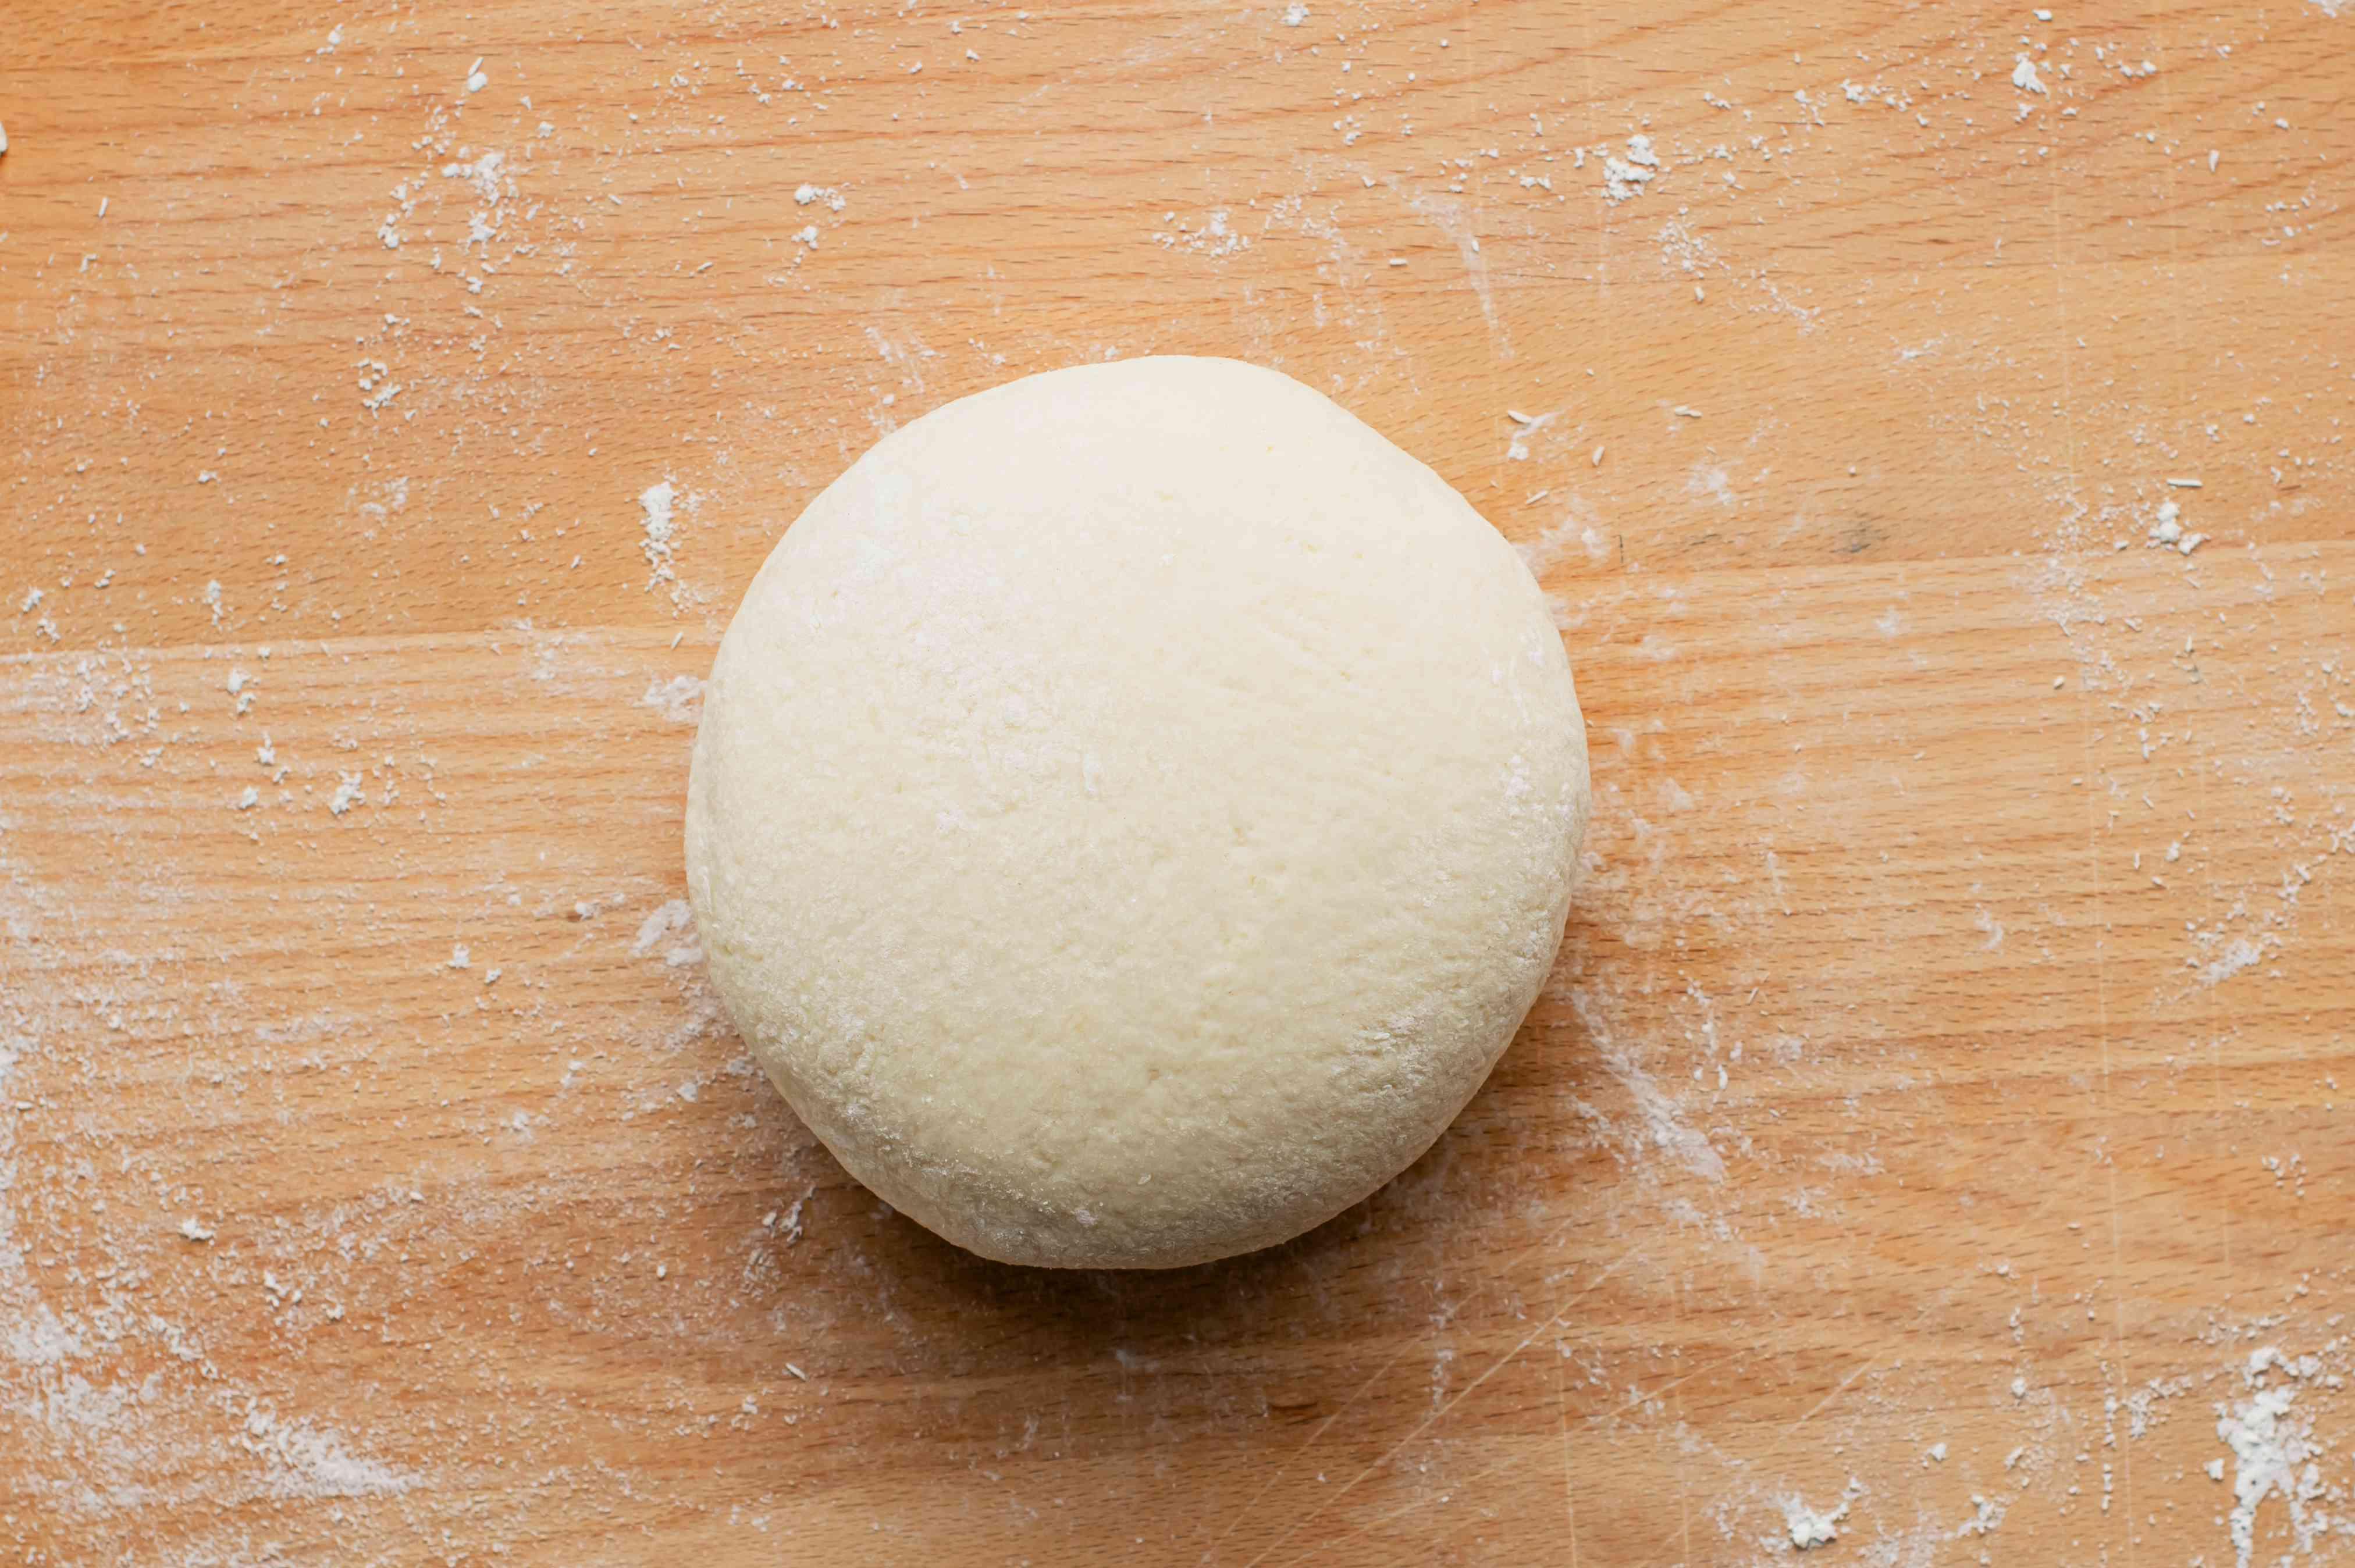 Smooth ball of gnocchi dough